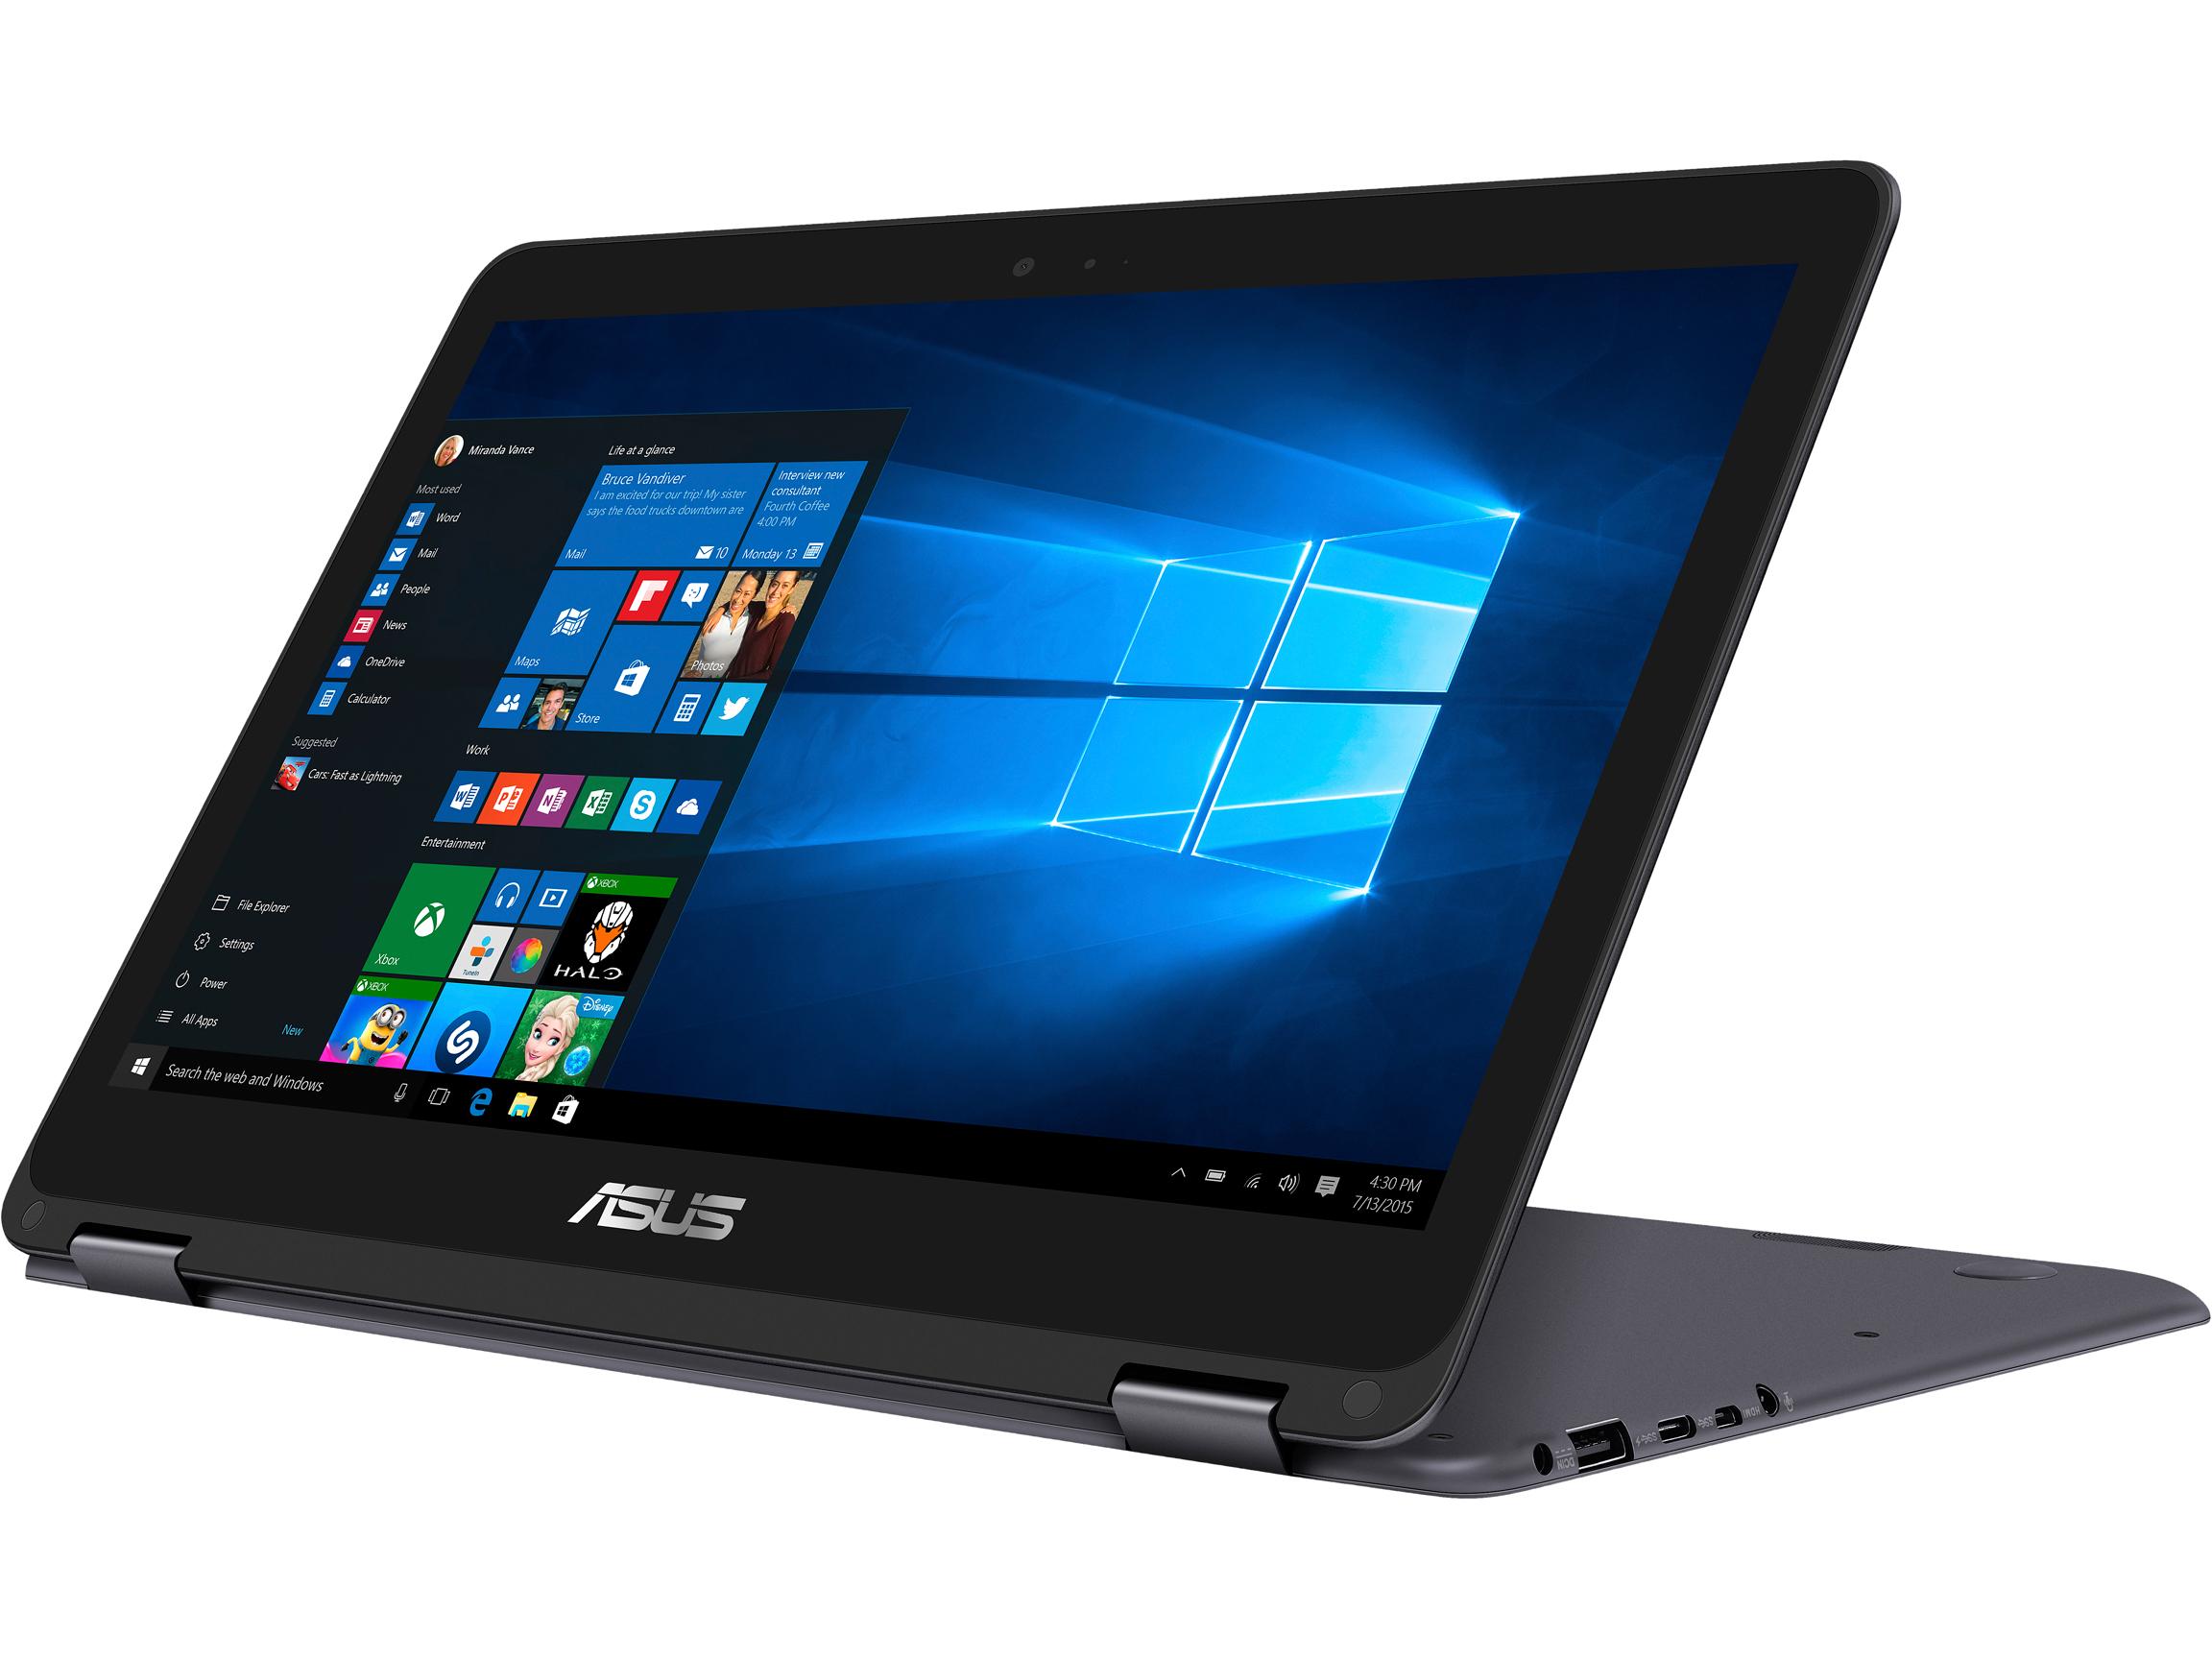 "Asus ZenBook Flip 13.3"" FHD Intel Core m3 Convertible Laptop"